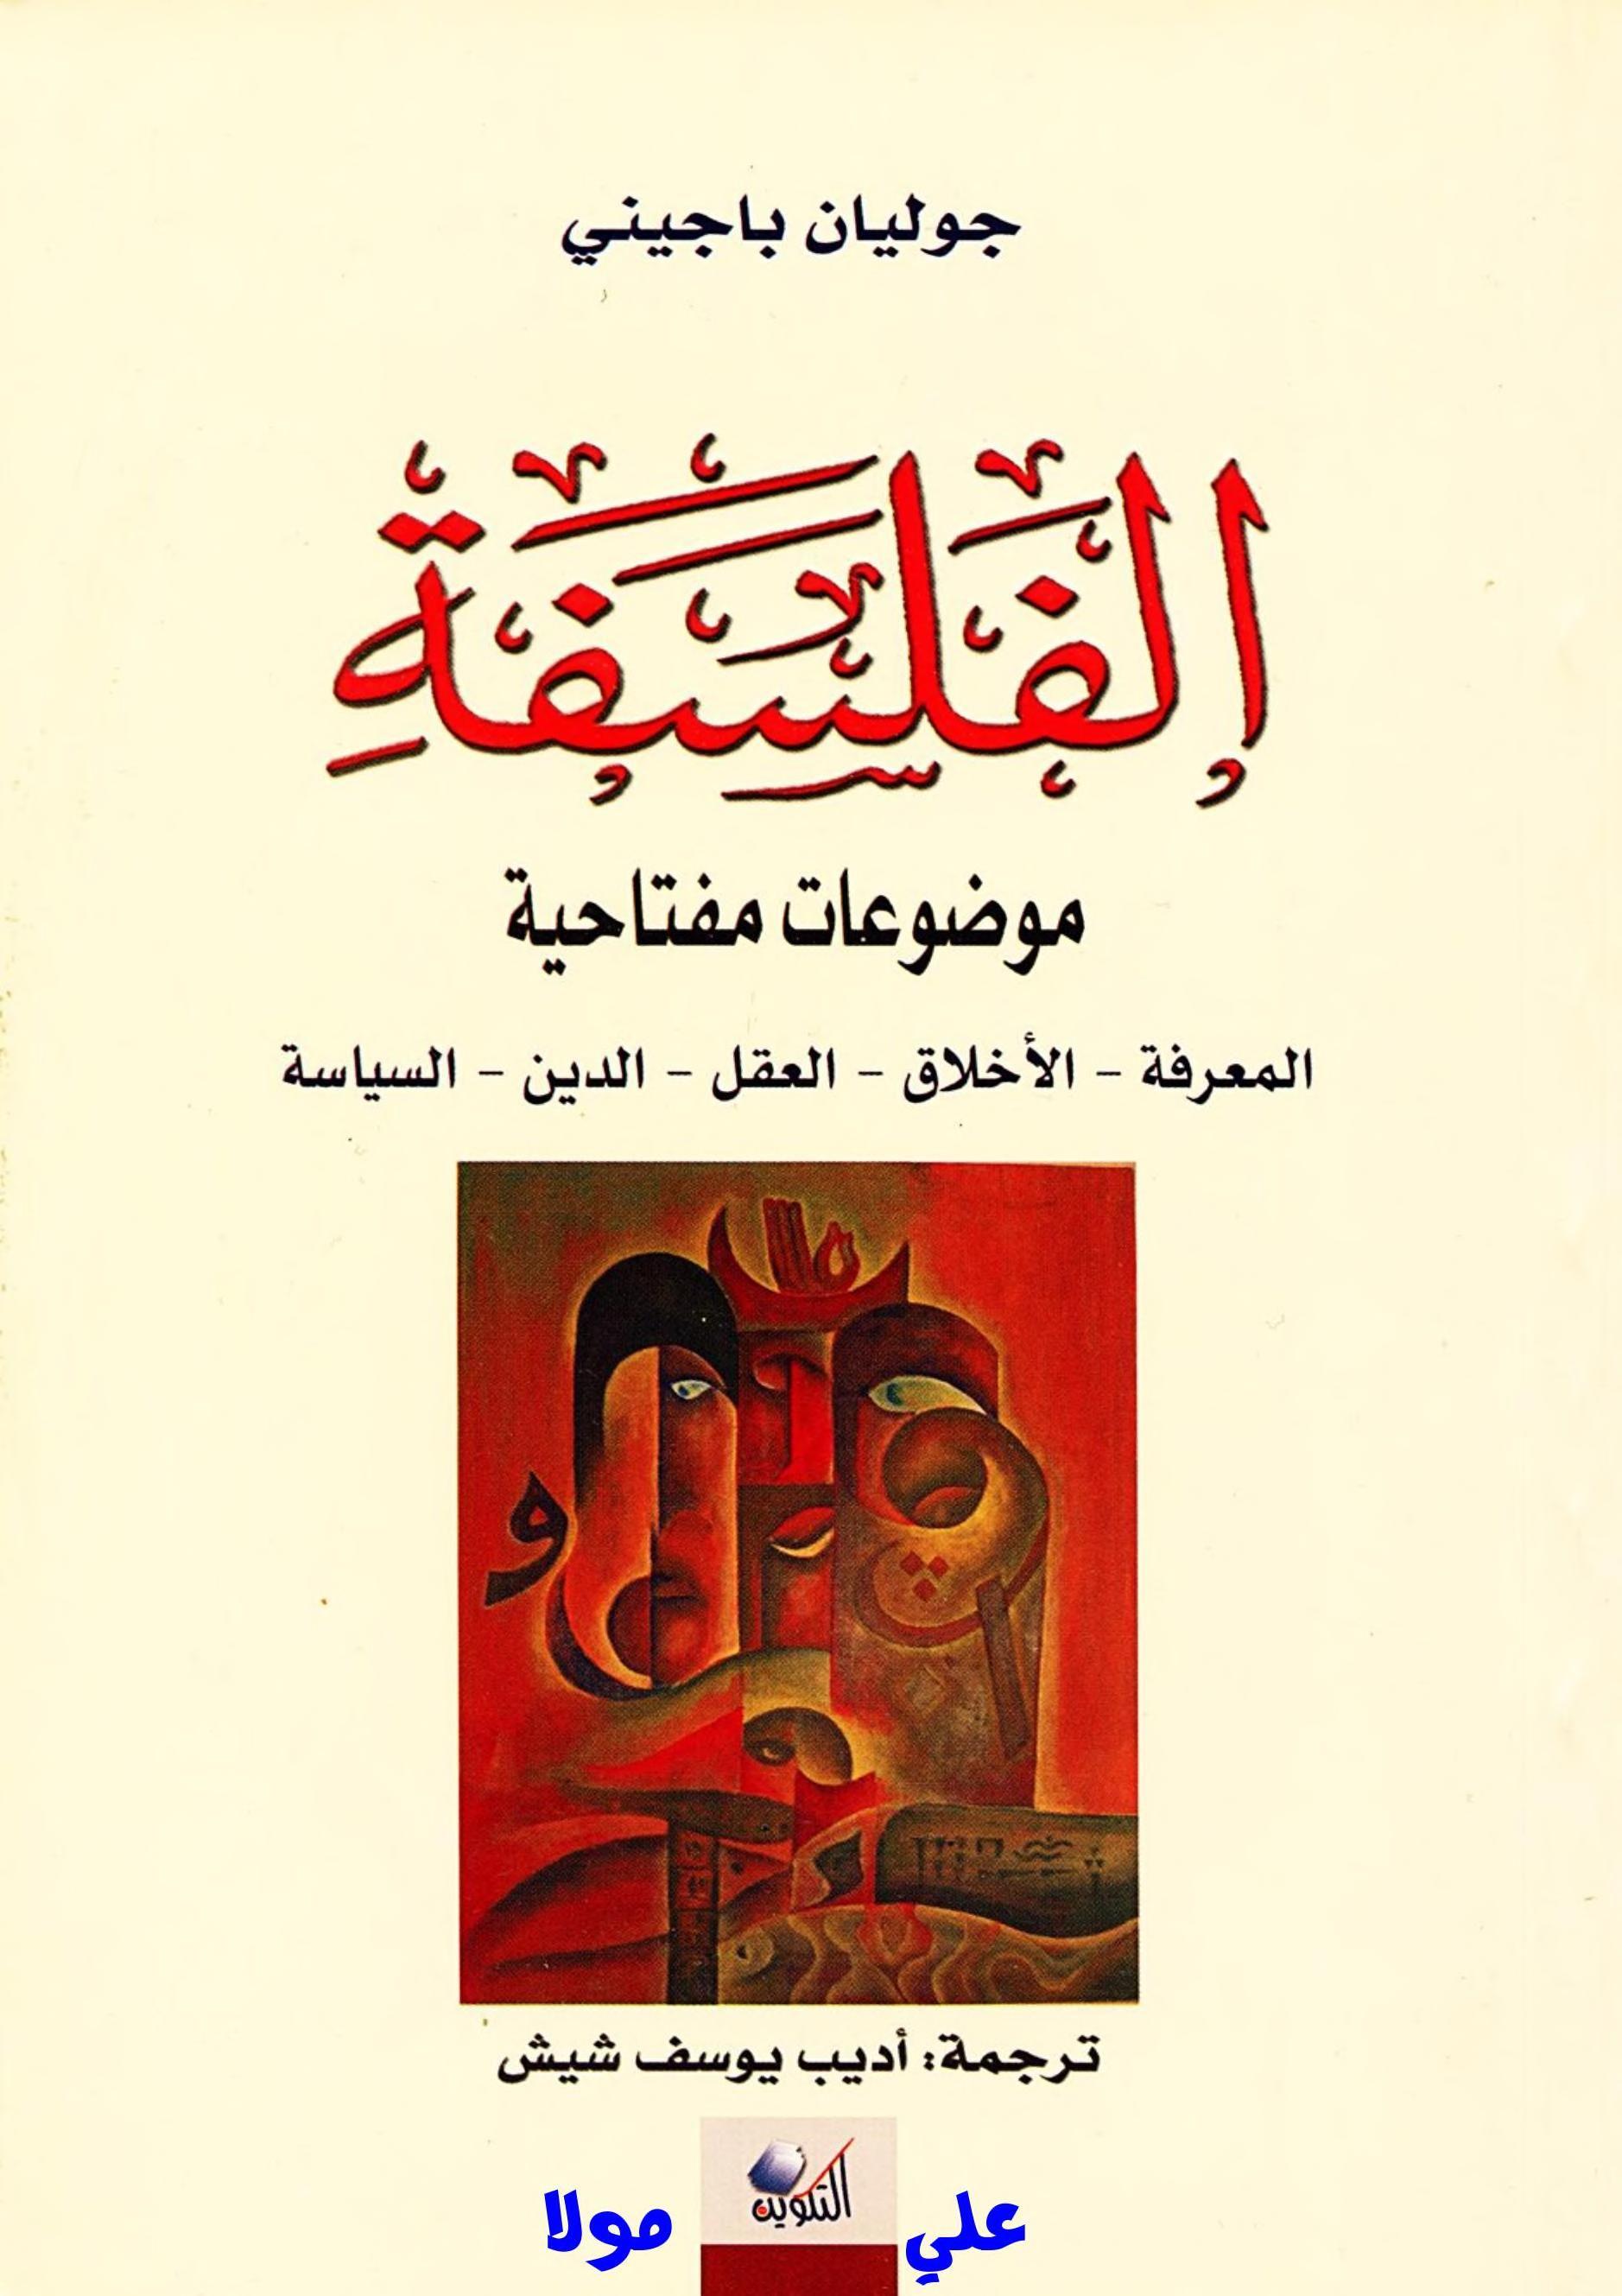 الفلسفة والسعادة ليزا بورتولوتي Free Download Borrow And Streaming Internet Archive In 2021 Arabic Books Ebooks Free Books Book Names